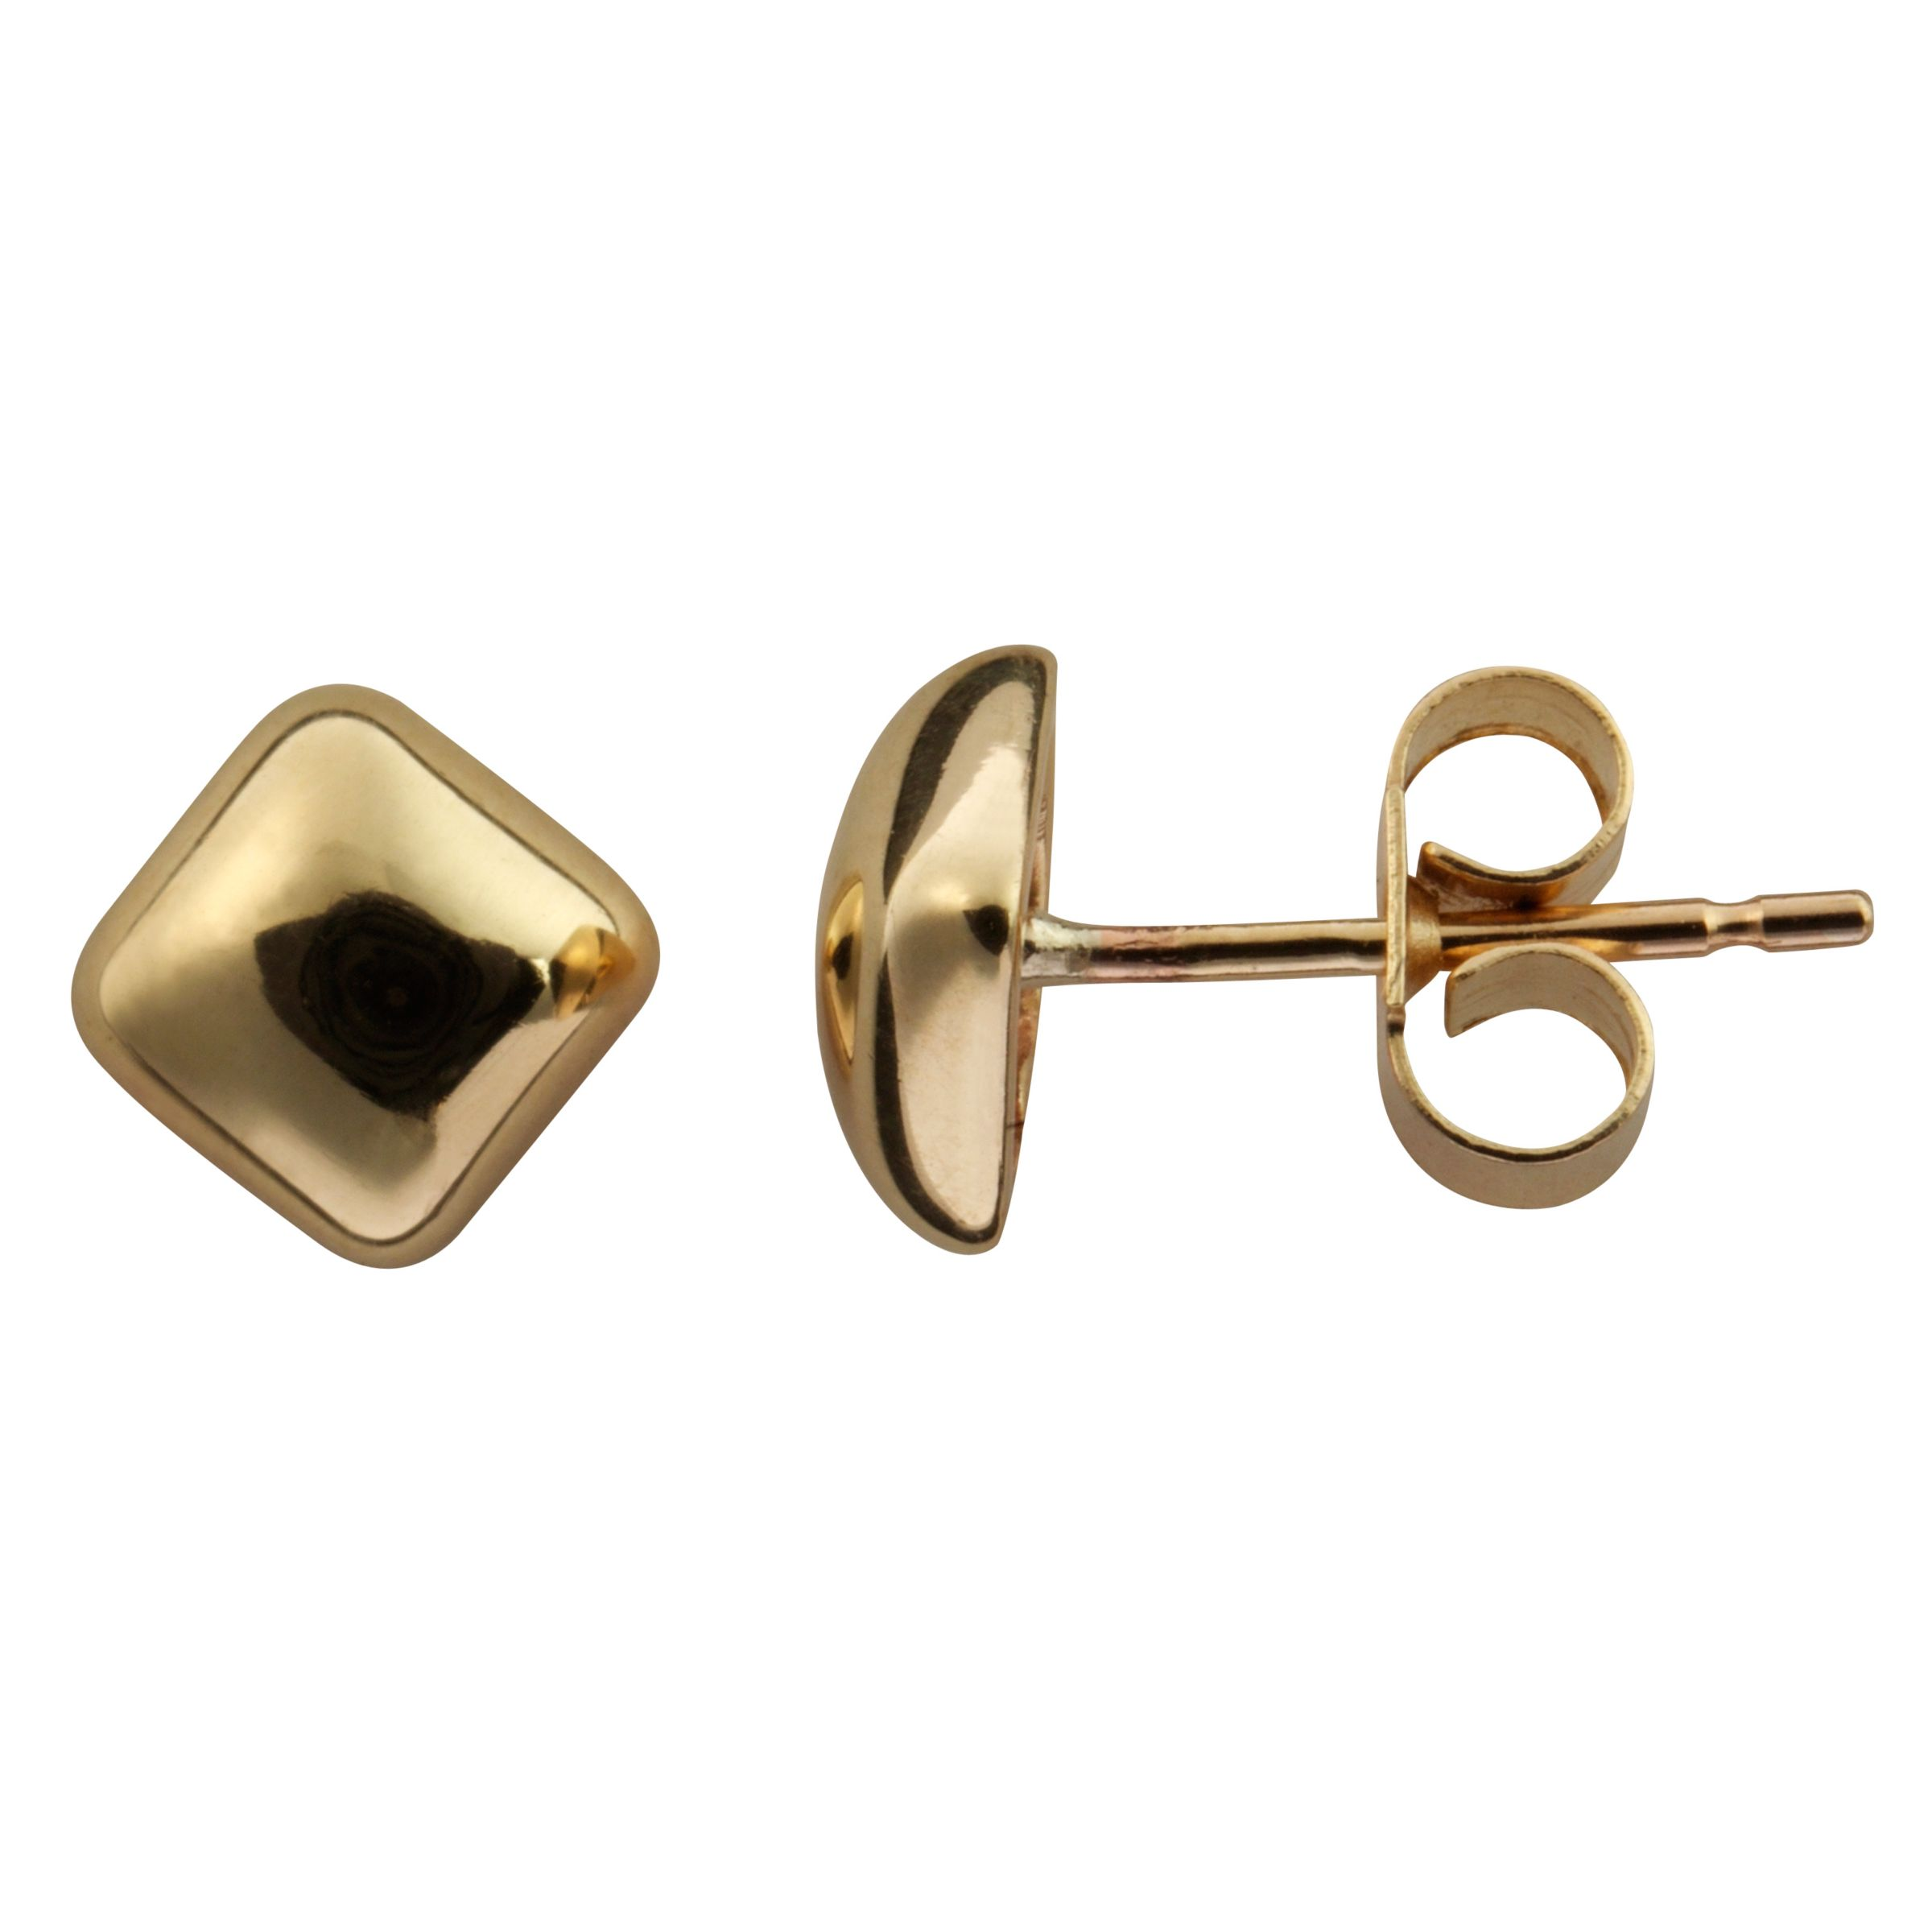 Nina Breddal Yellow Gold Square Stud Earrings, Gold